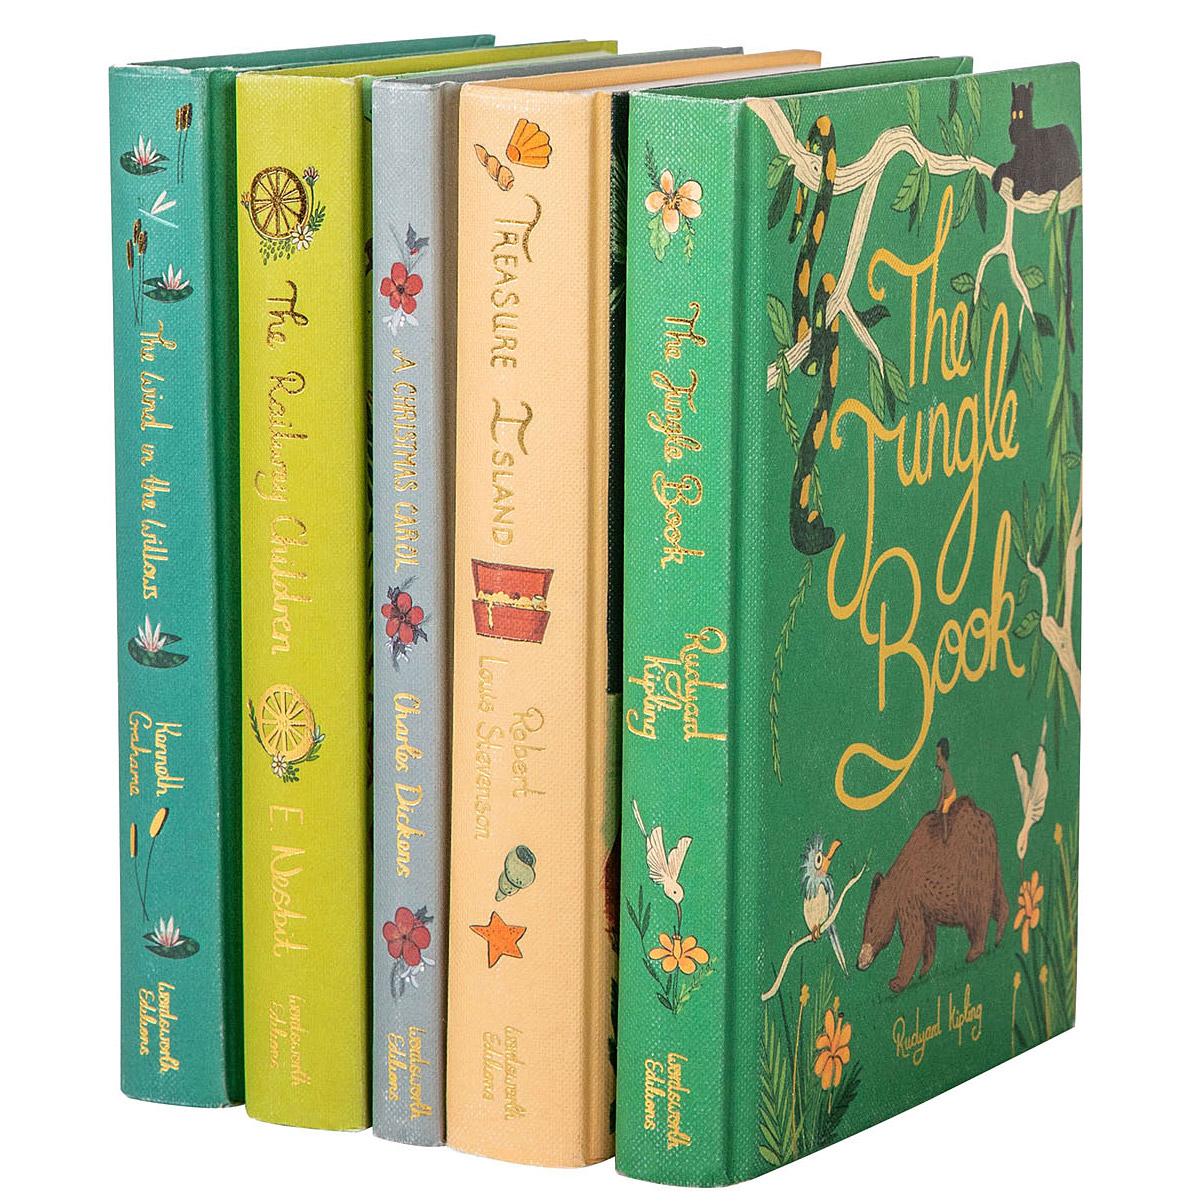 five classic books